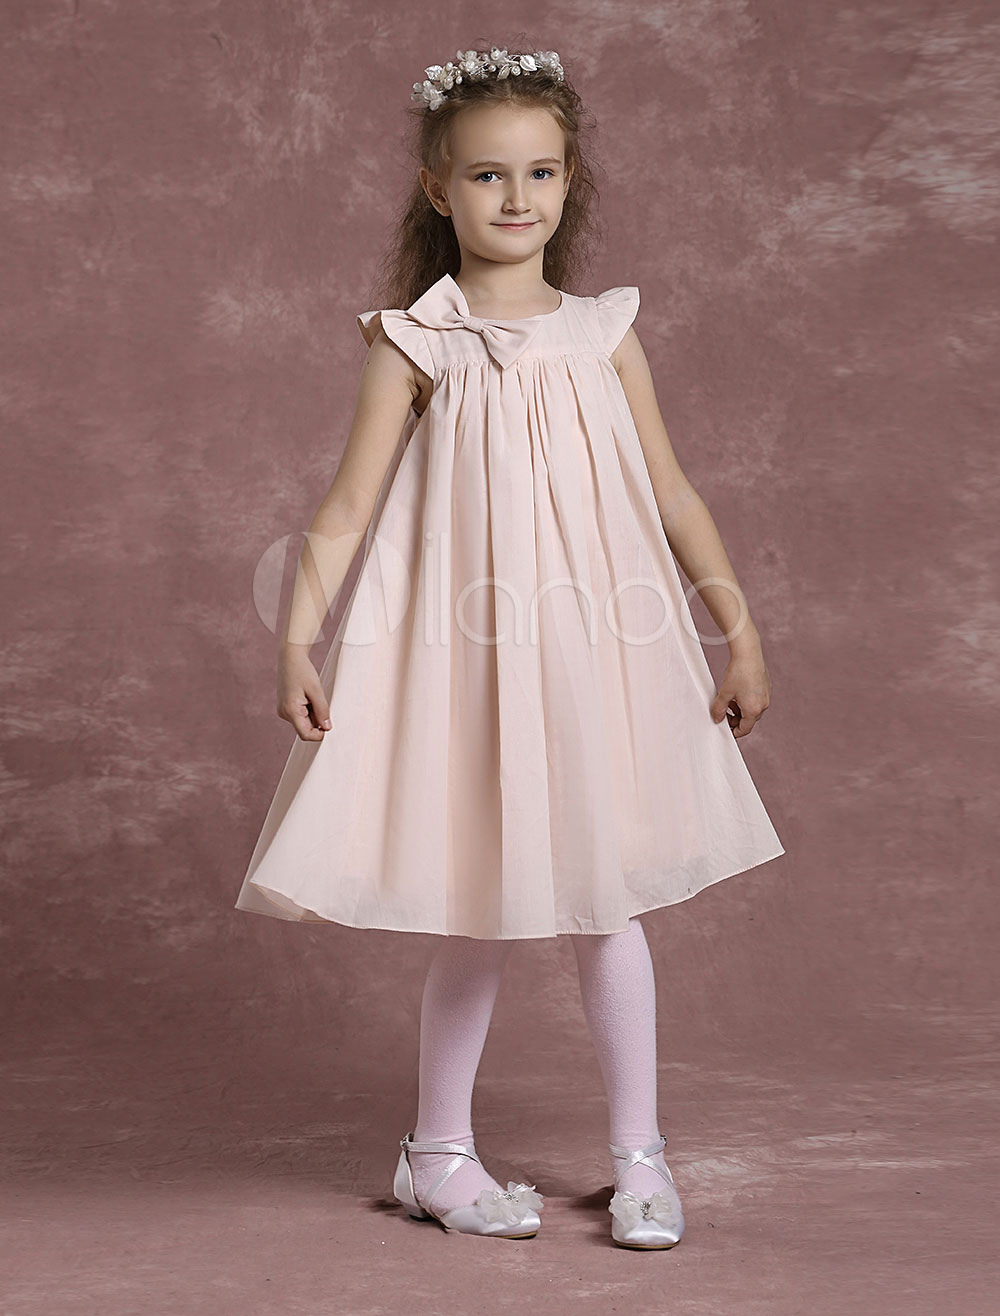 Blush Pink Flower Girl Dress Boho Ruffle Cotton Cap Sleeves Short Kids Dresses